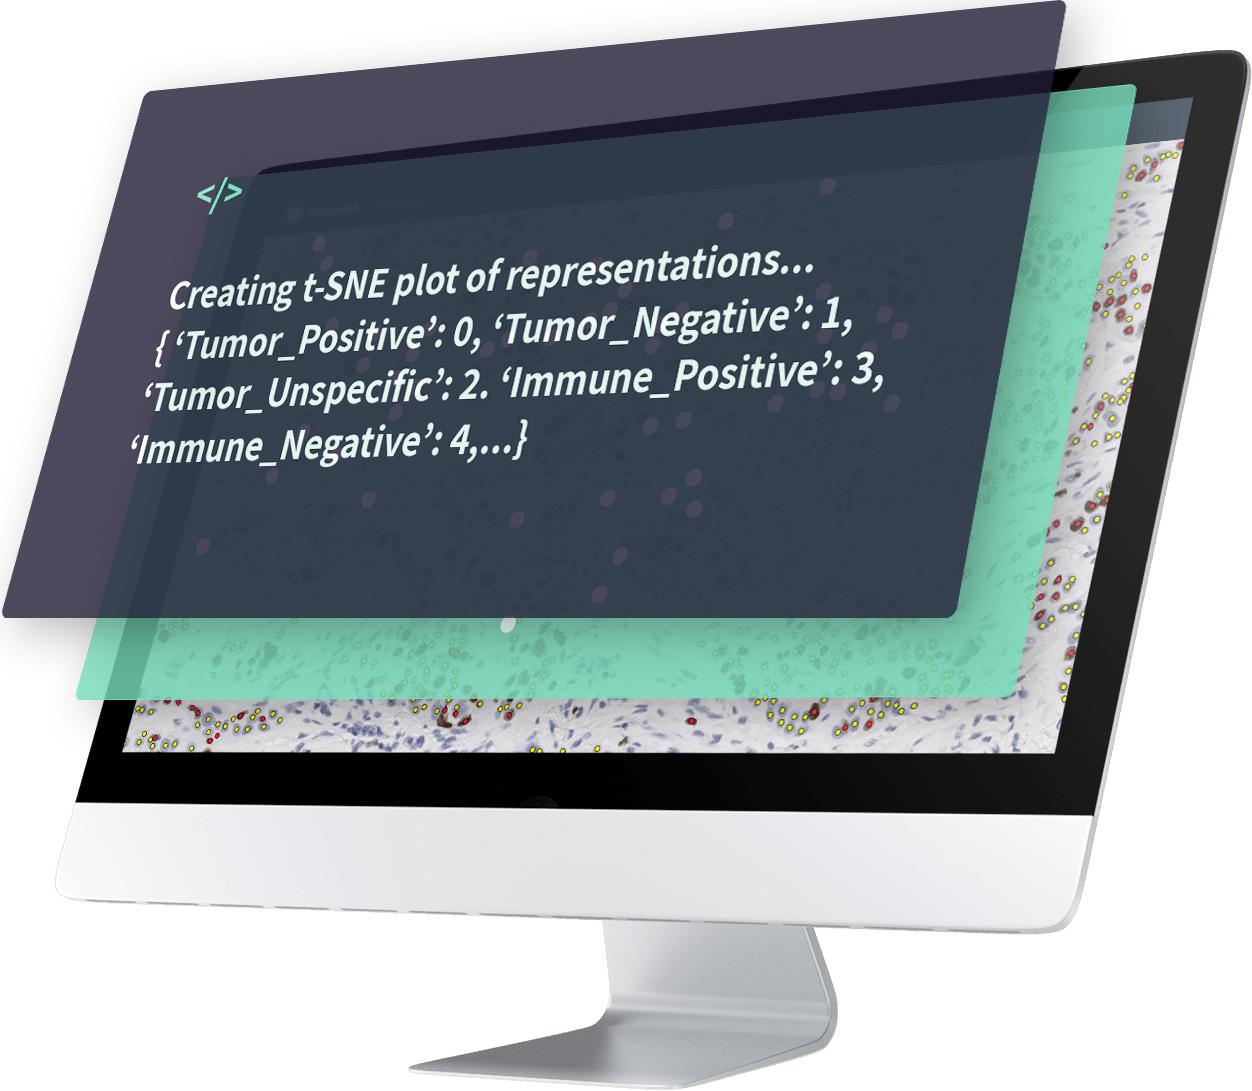 Concept image of Mindpeak code on a monitor